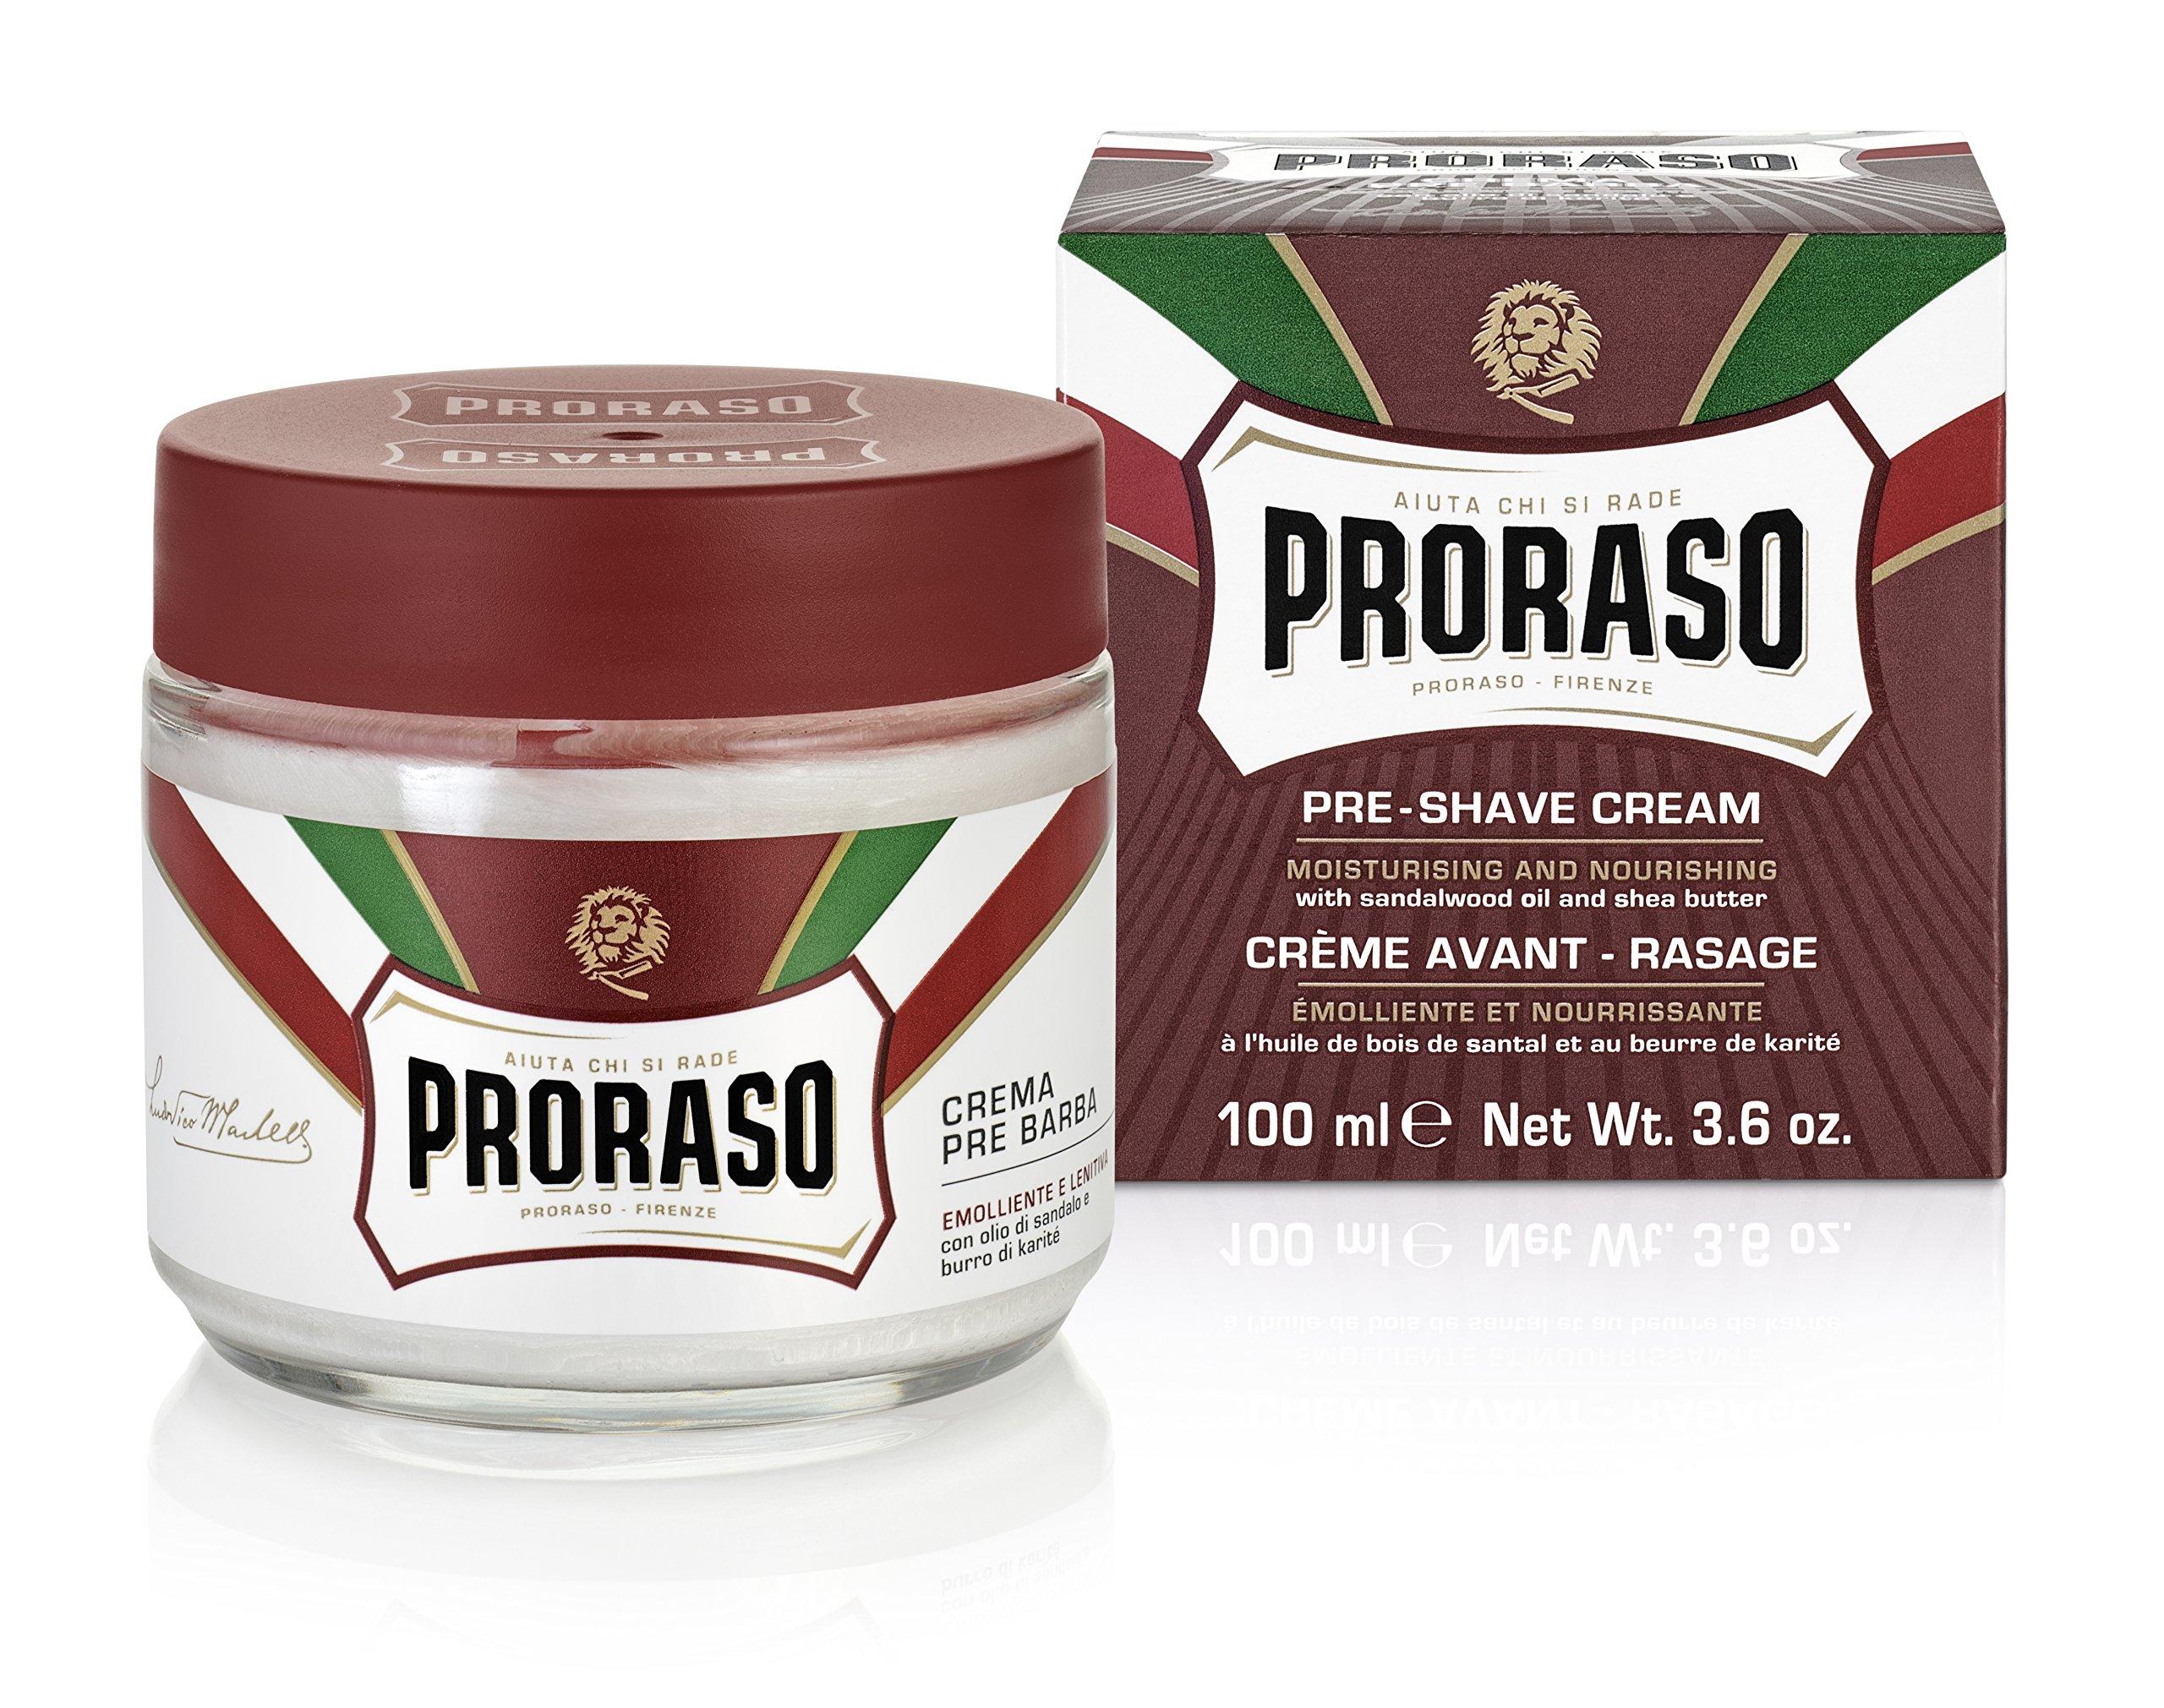 Proraso Pre-Shave Cream, Moisturizing and Nourishing, 3.6 oz